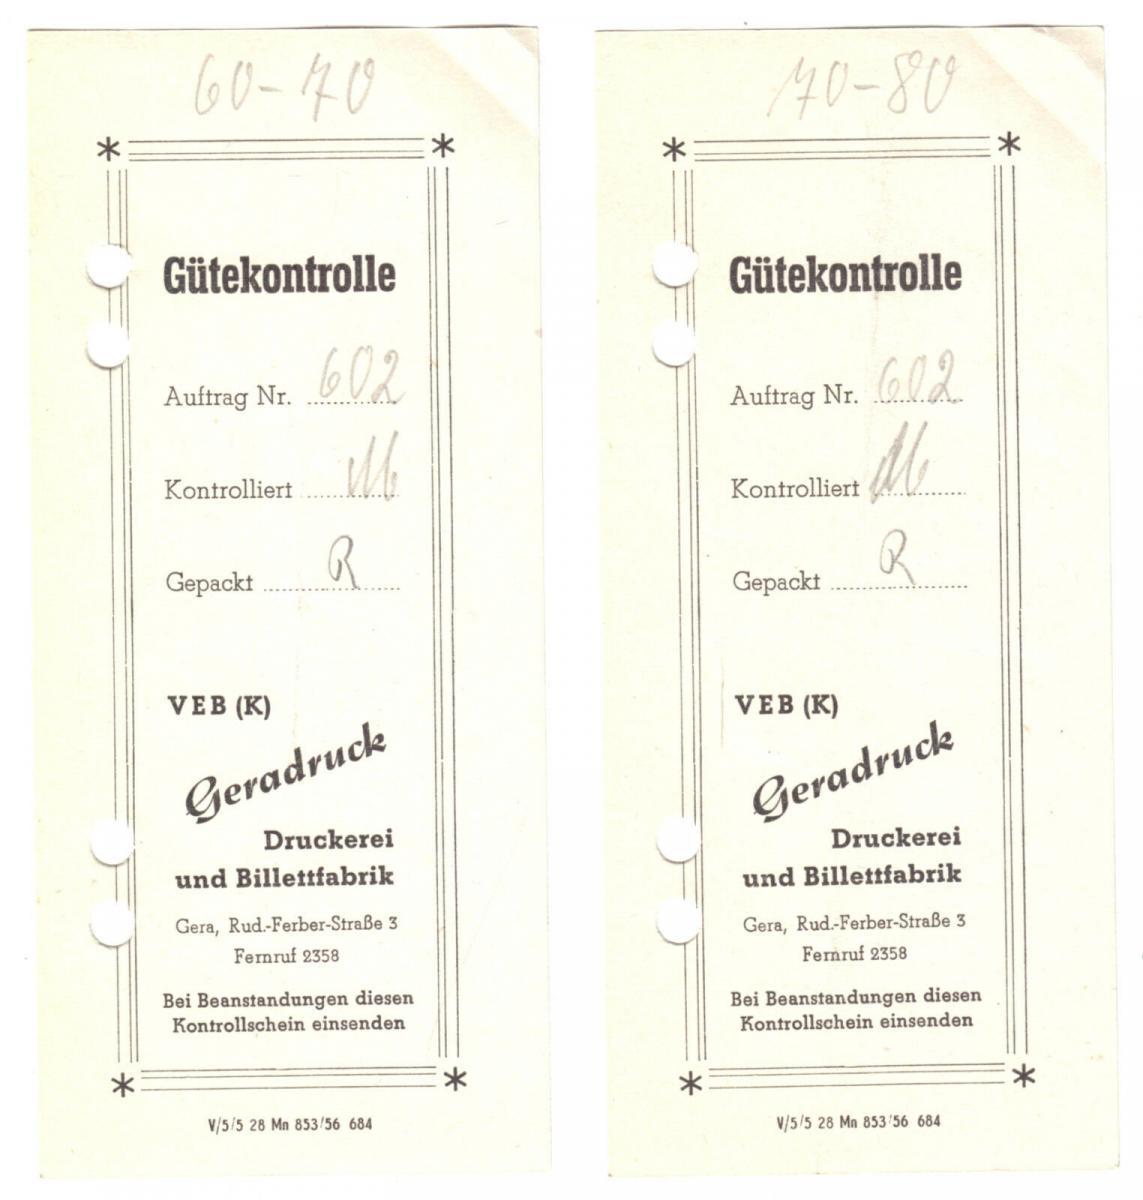 Zwei Gütekontrolle - Zettel, VEB (K) Geradruck, Druckerei u. Billettfabrik, 1956